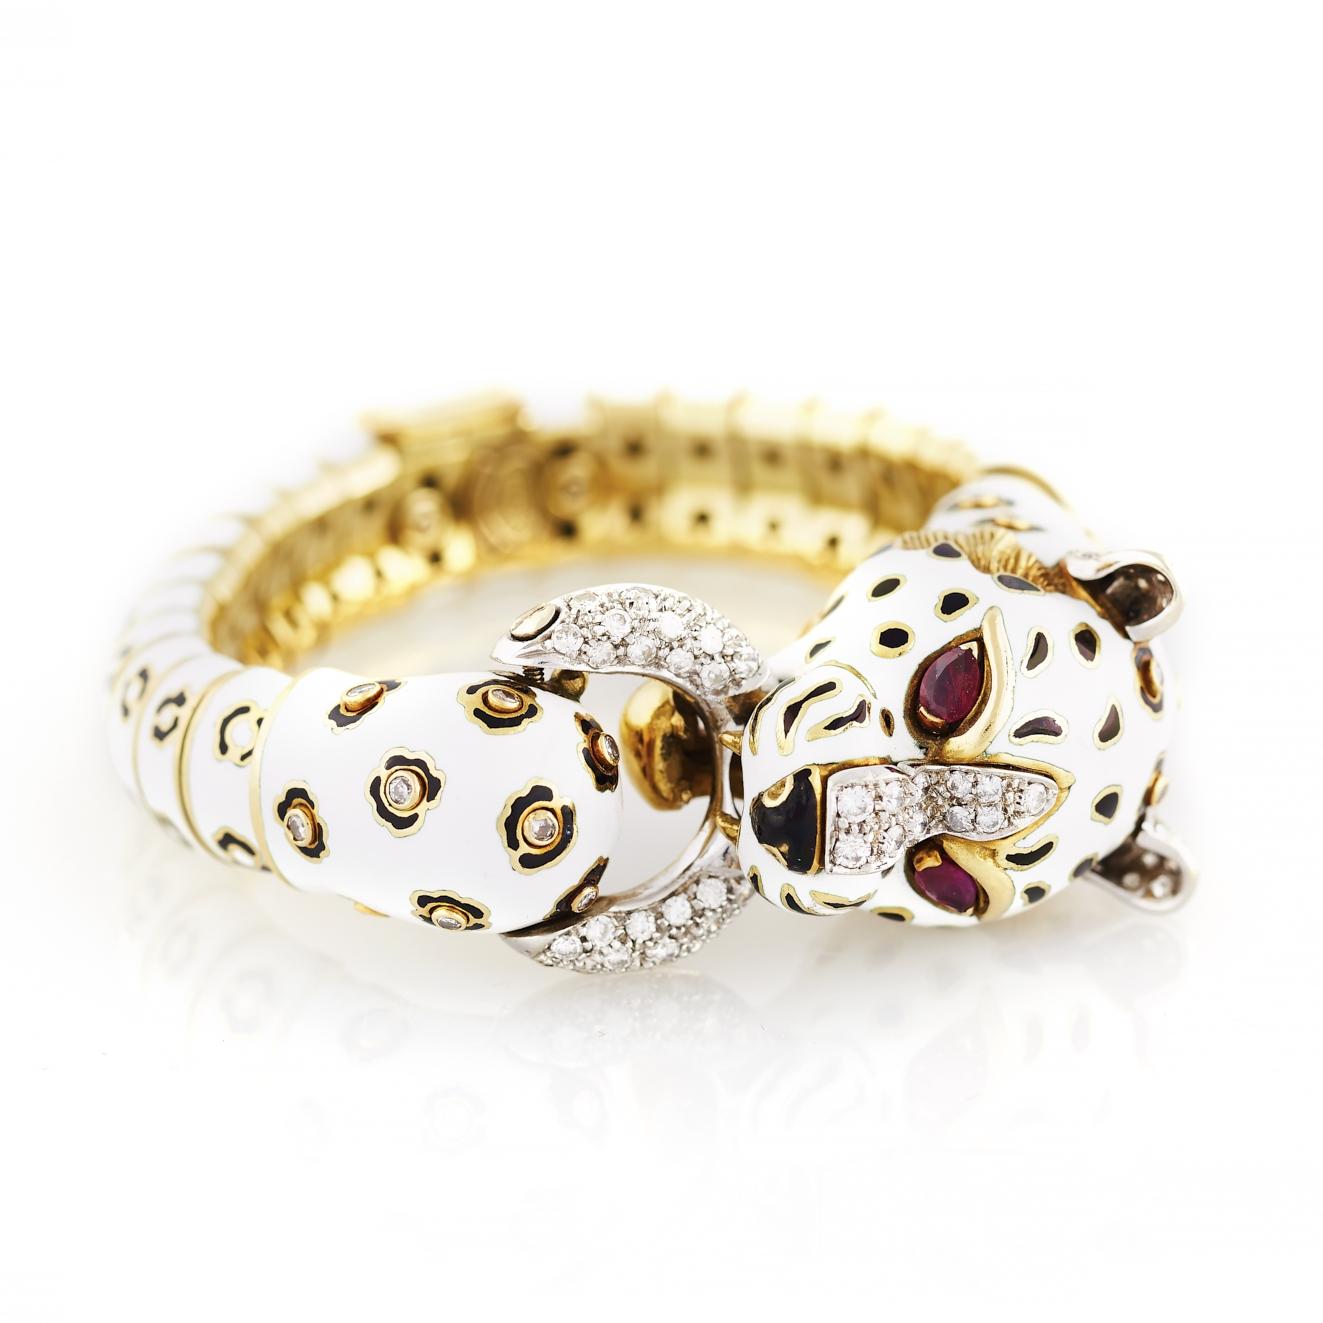 Frascarolo Enamel, Gold, and Diamond Tiger Bangle